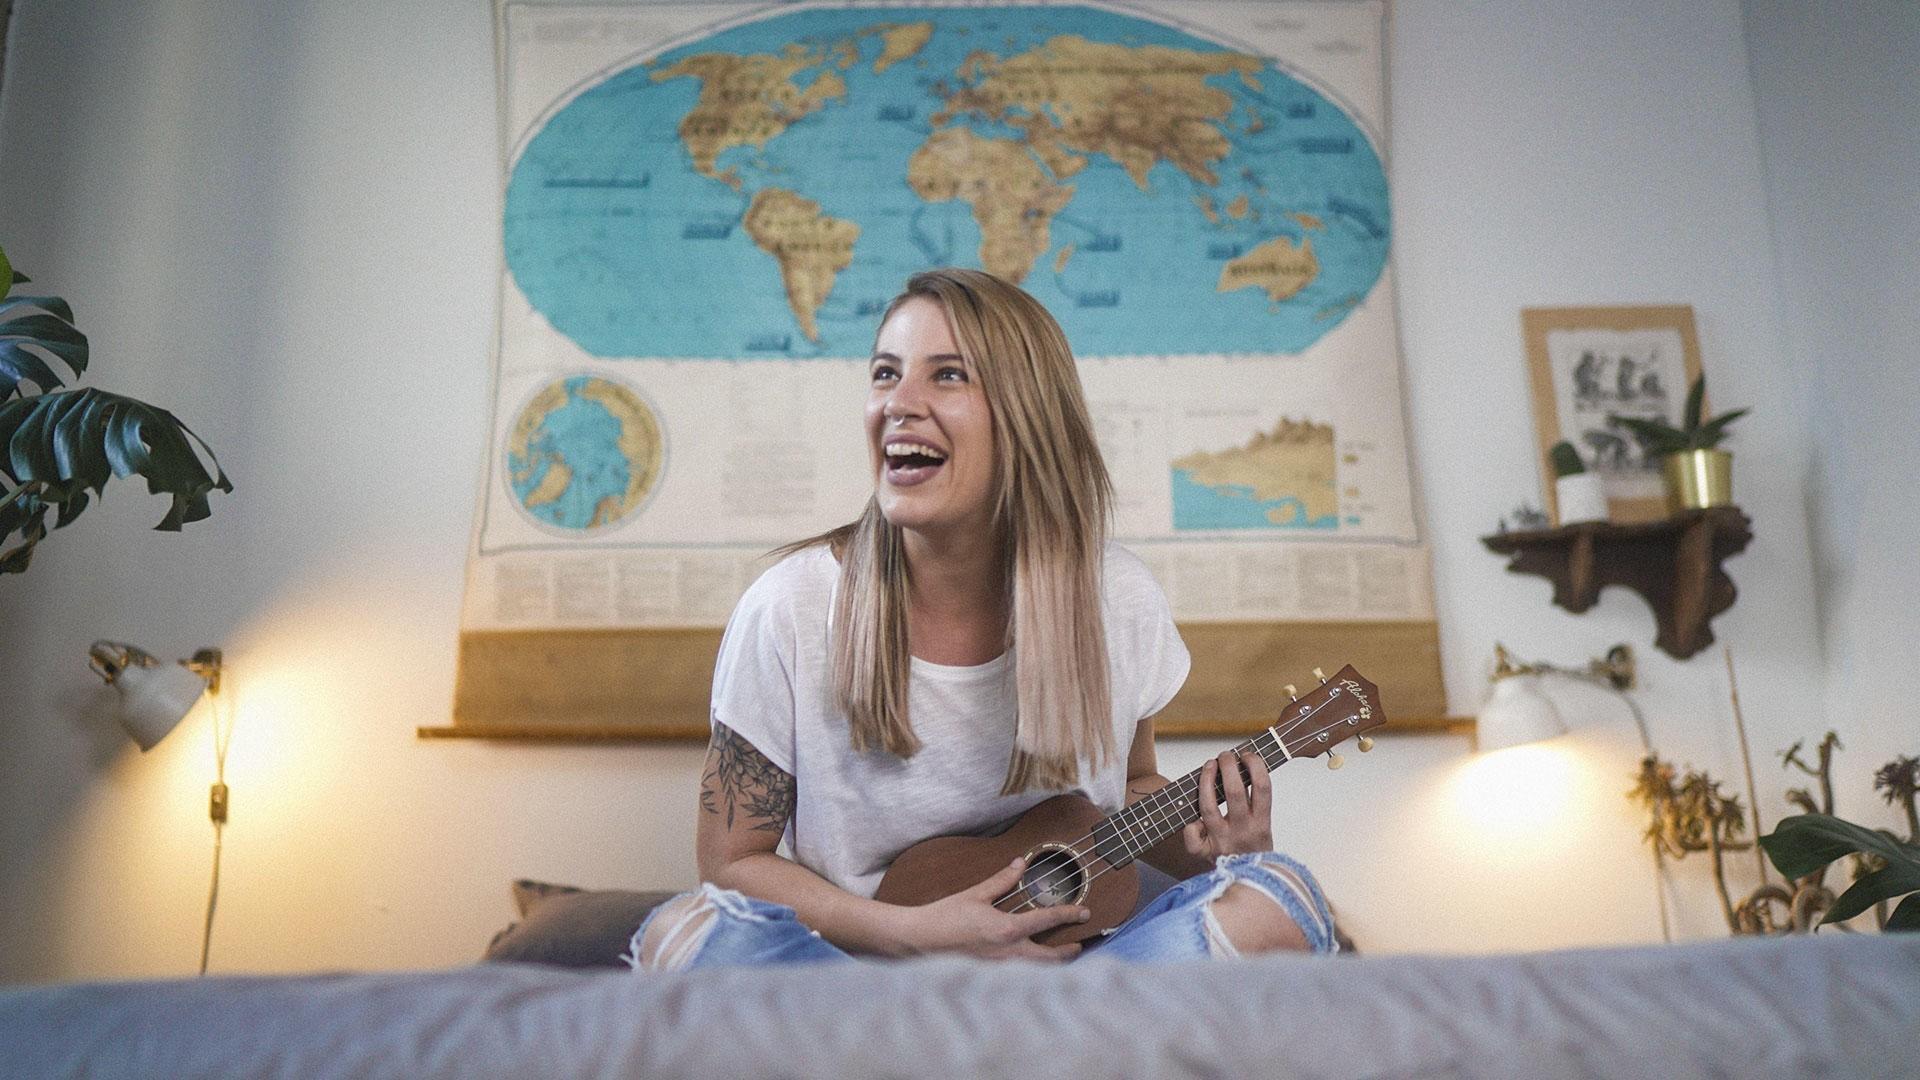 Heidi Priebe World Map ENFP Happy